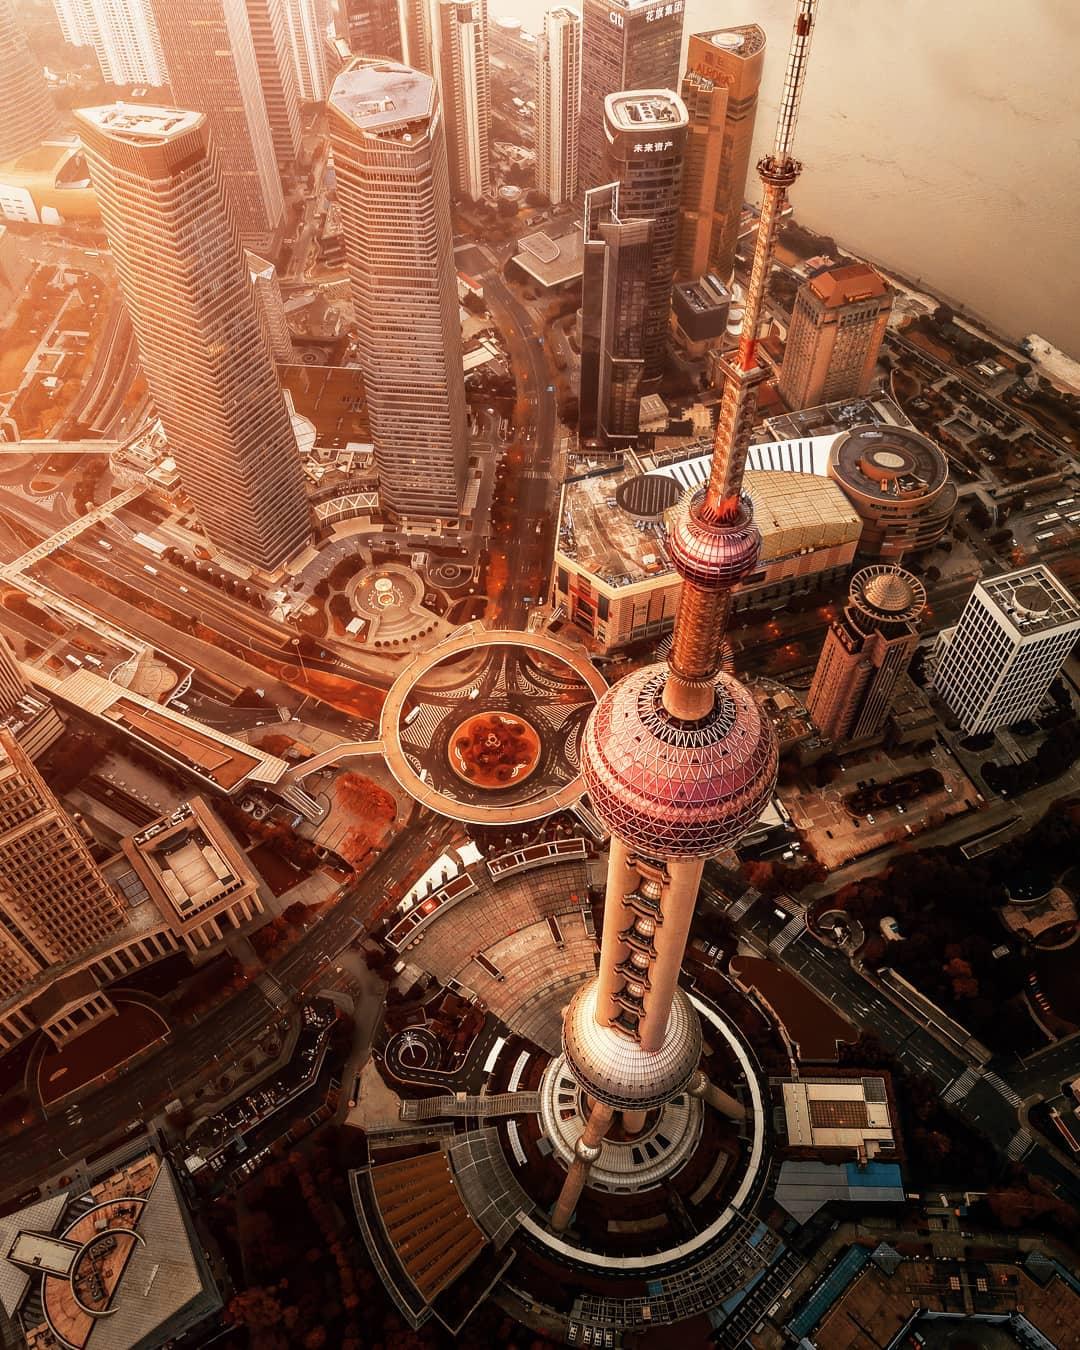 Красота Шанхая в фотографиях Марка Зигемунда